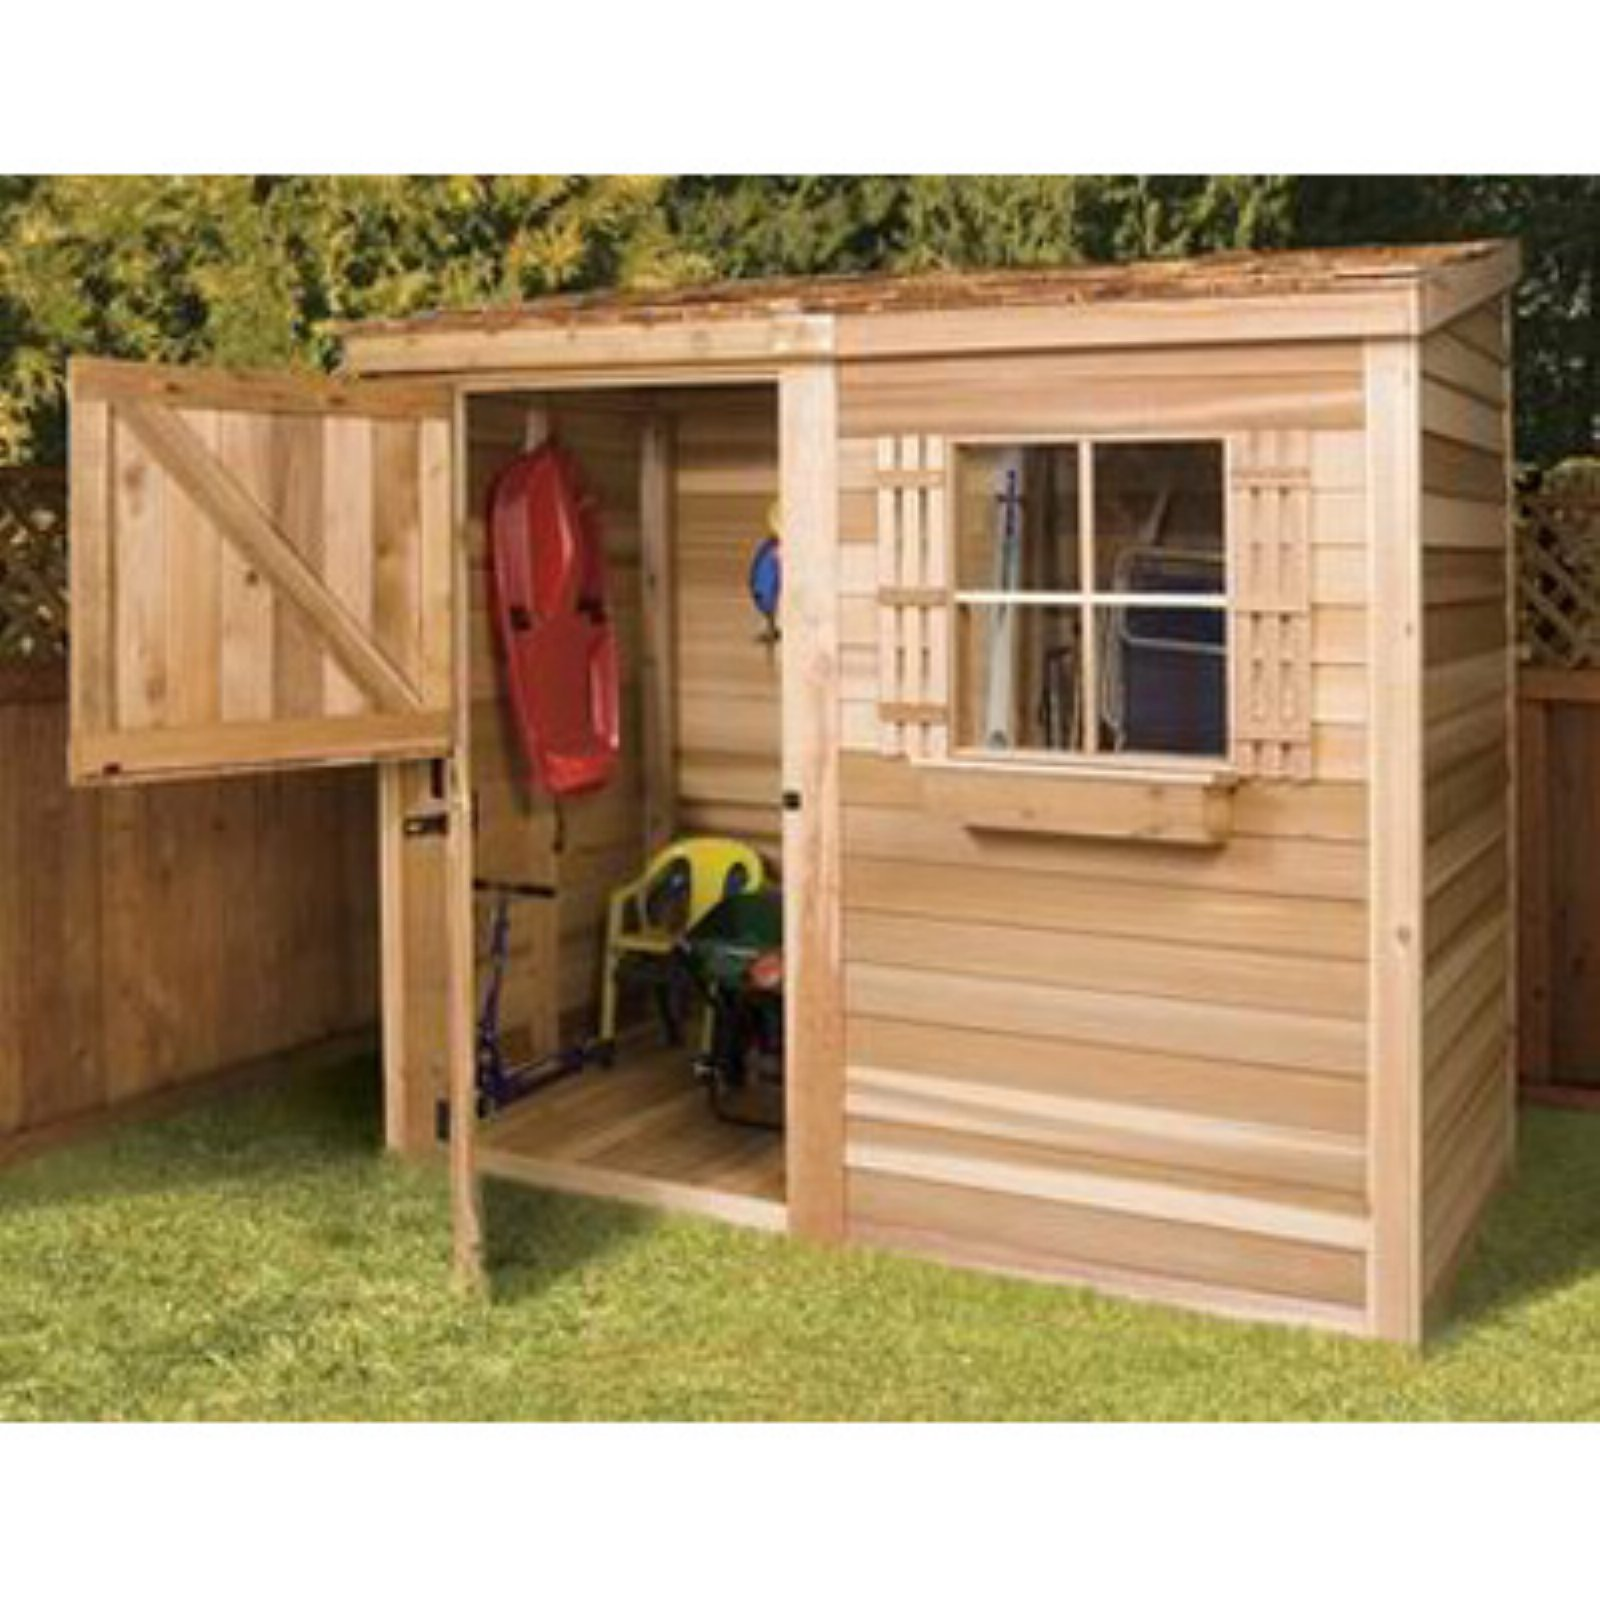 Cedar Shed 8 x 4 ft. Bayside Wood Storage Shed